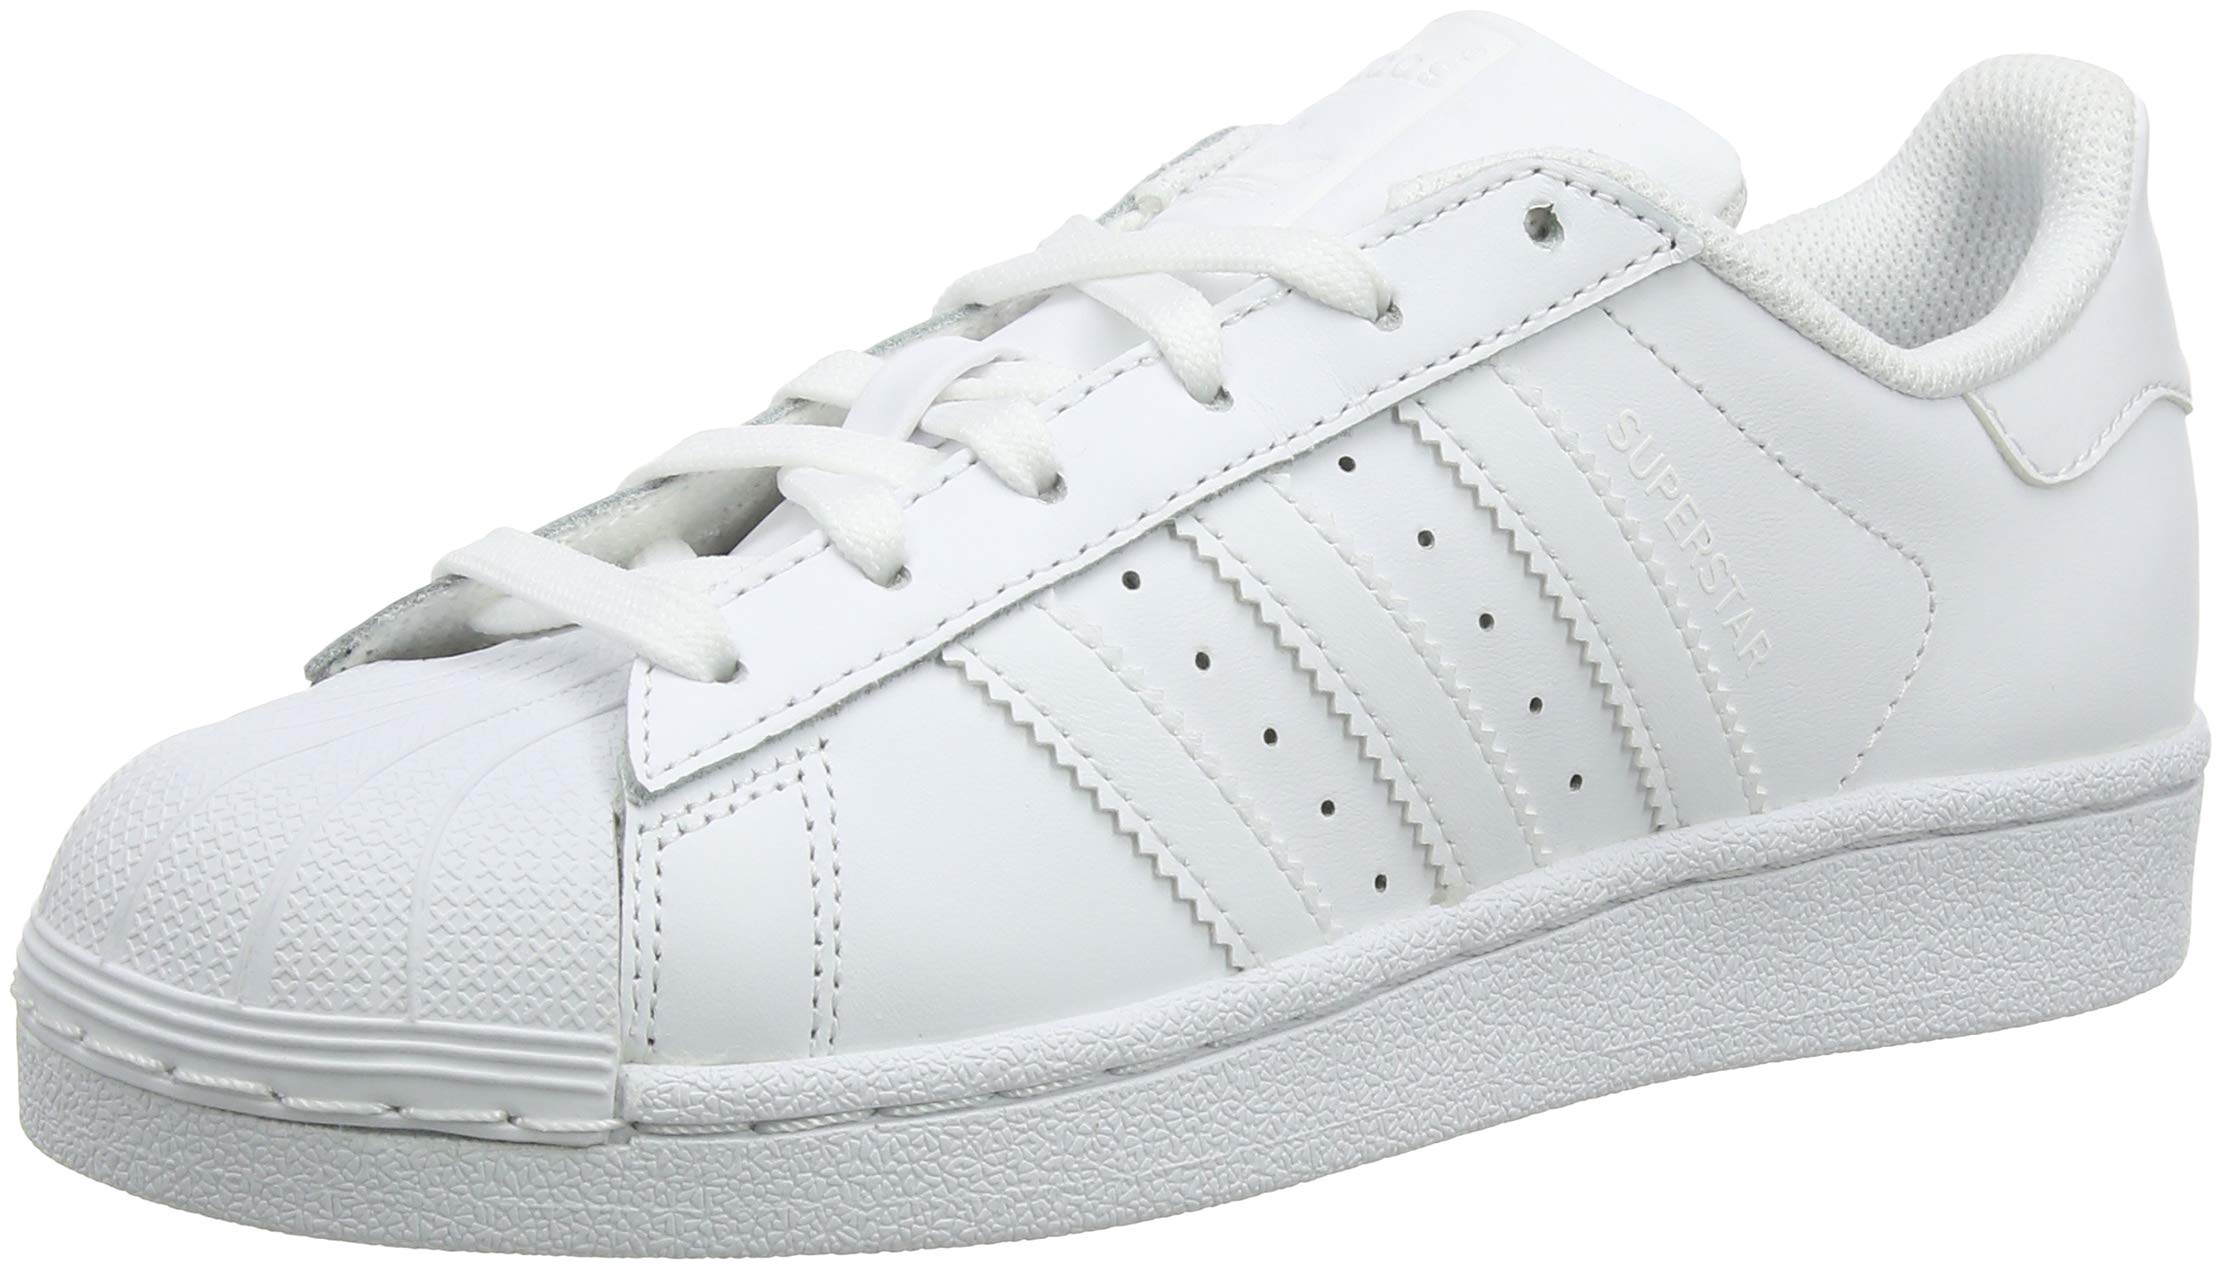 cheaper a336f d4a46 adidas Originals Superstar BB2872, Sneakers Unisex – Bambini